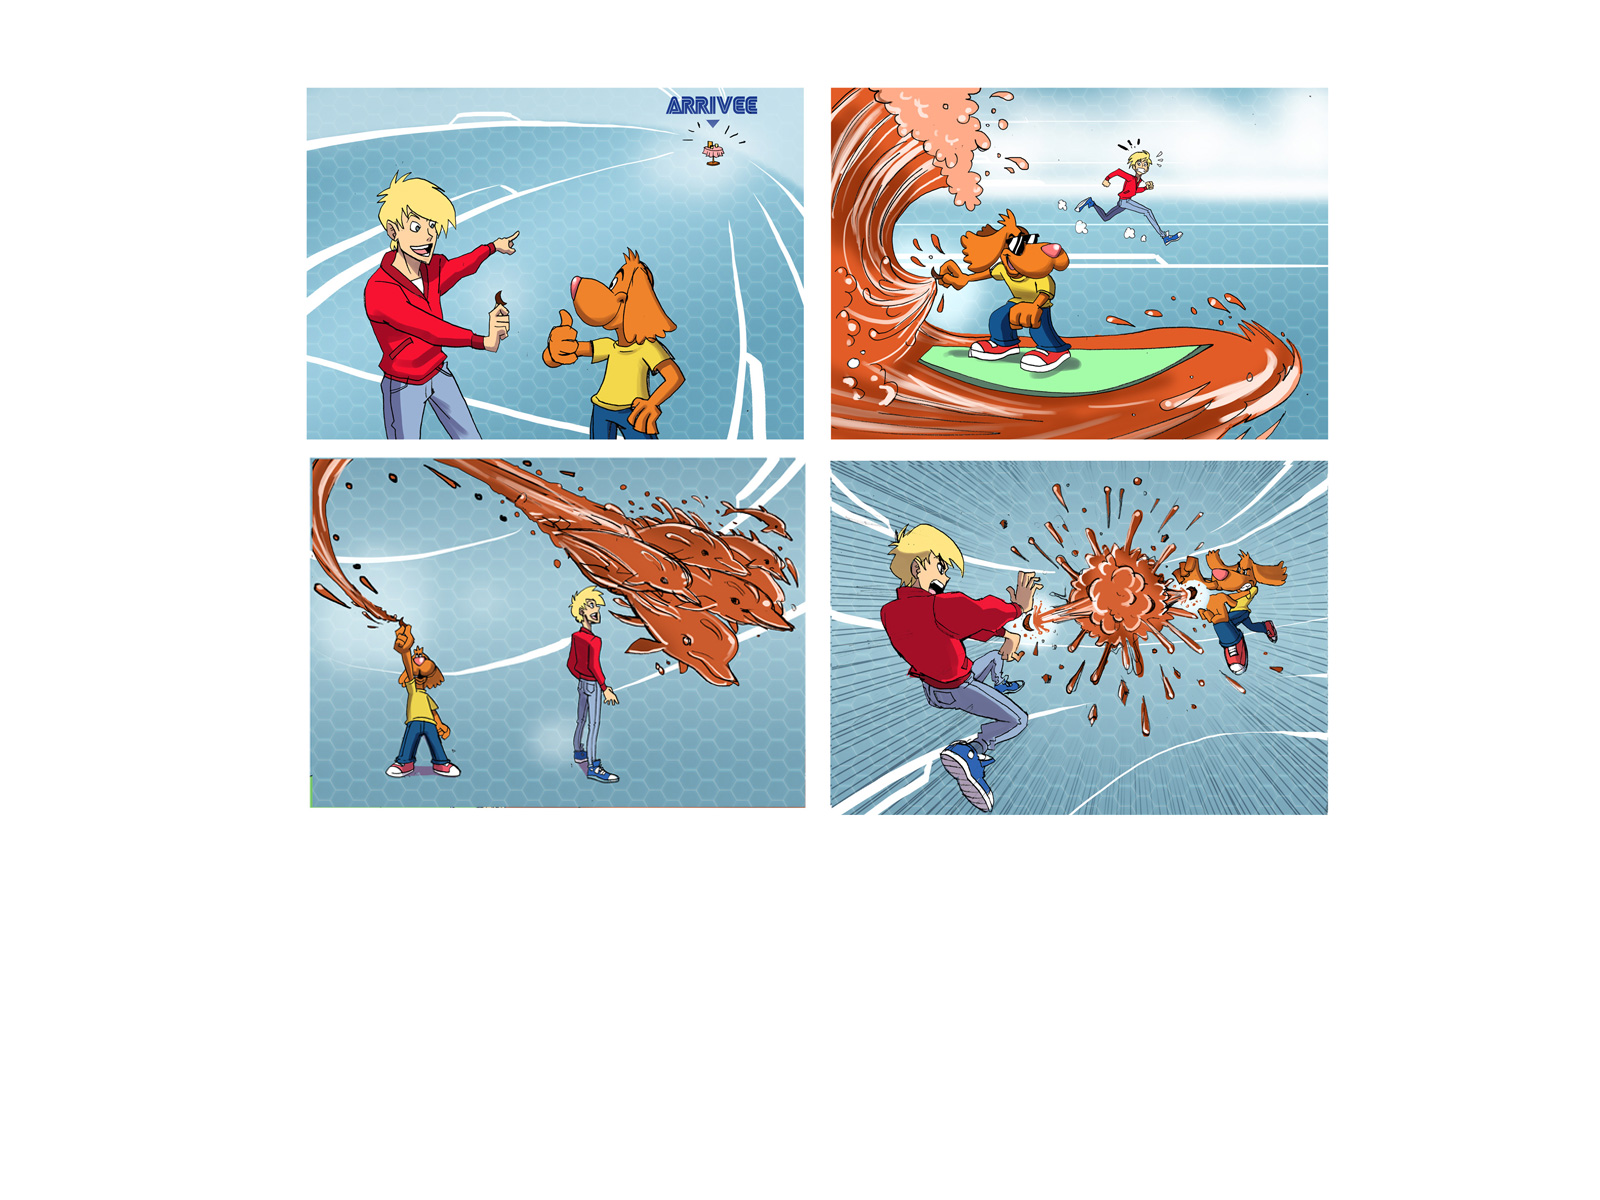 illustrations-alfonsorecio-1277